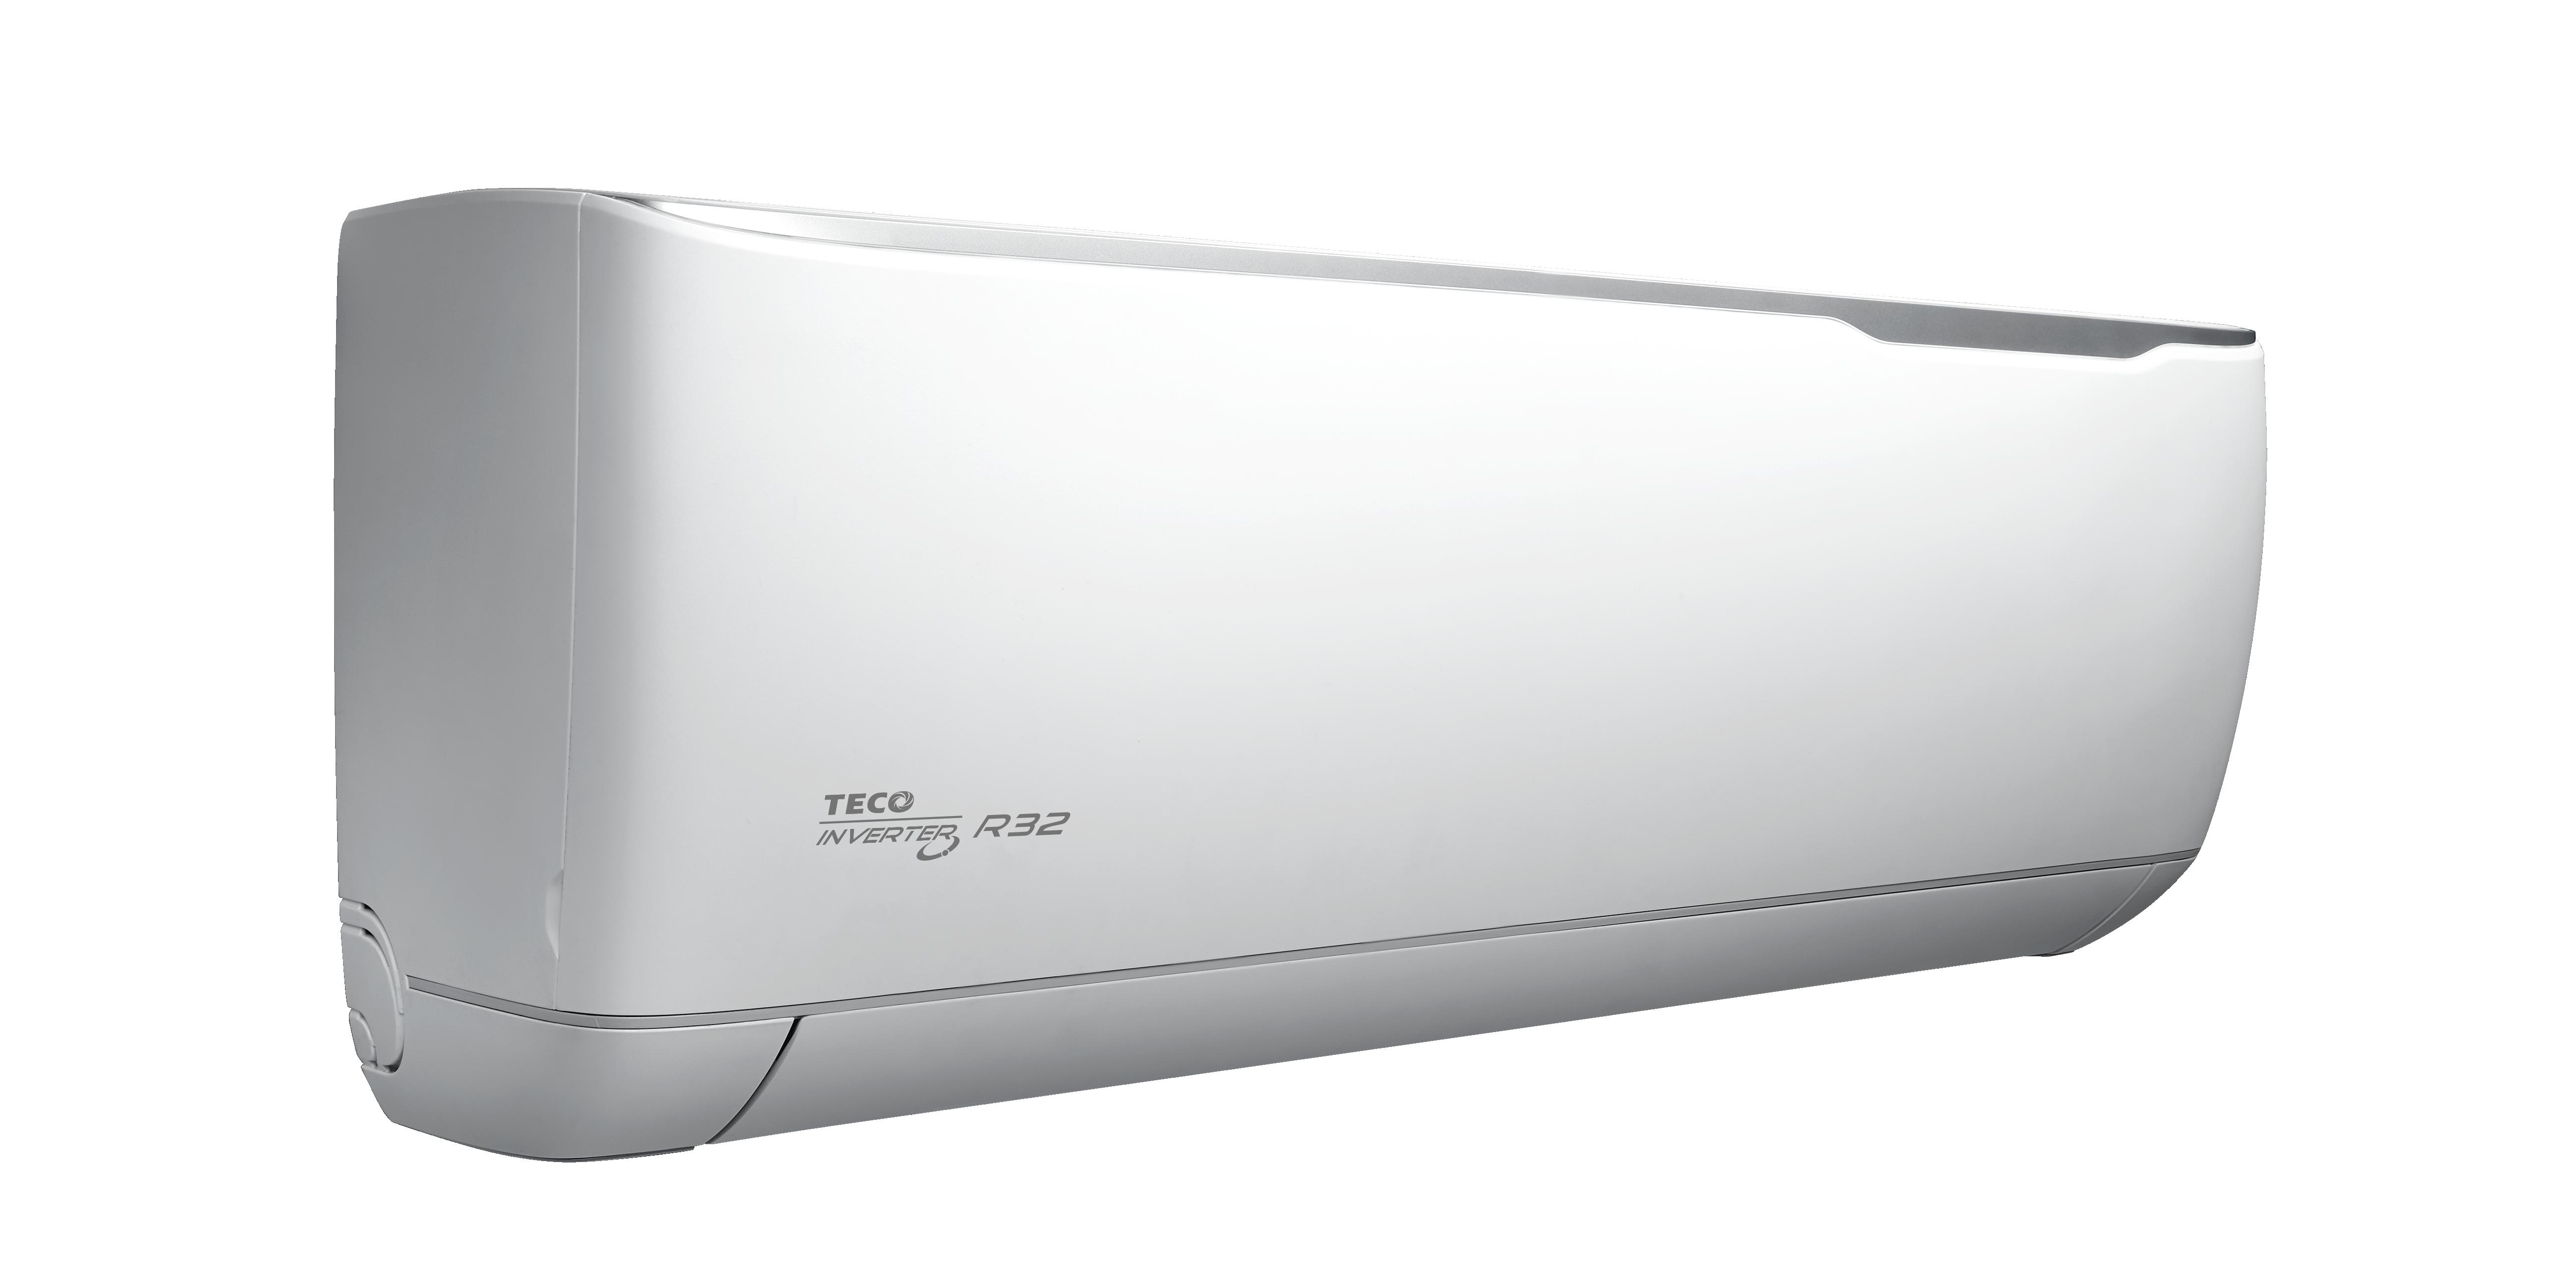 精品變頻空調冷暖/冷專R32冷媒 GA系列MS50IH-GA / MA50IH-GA